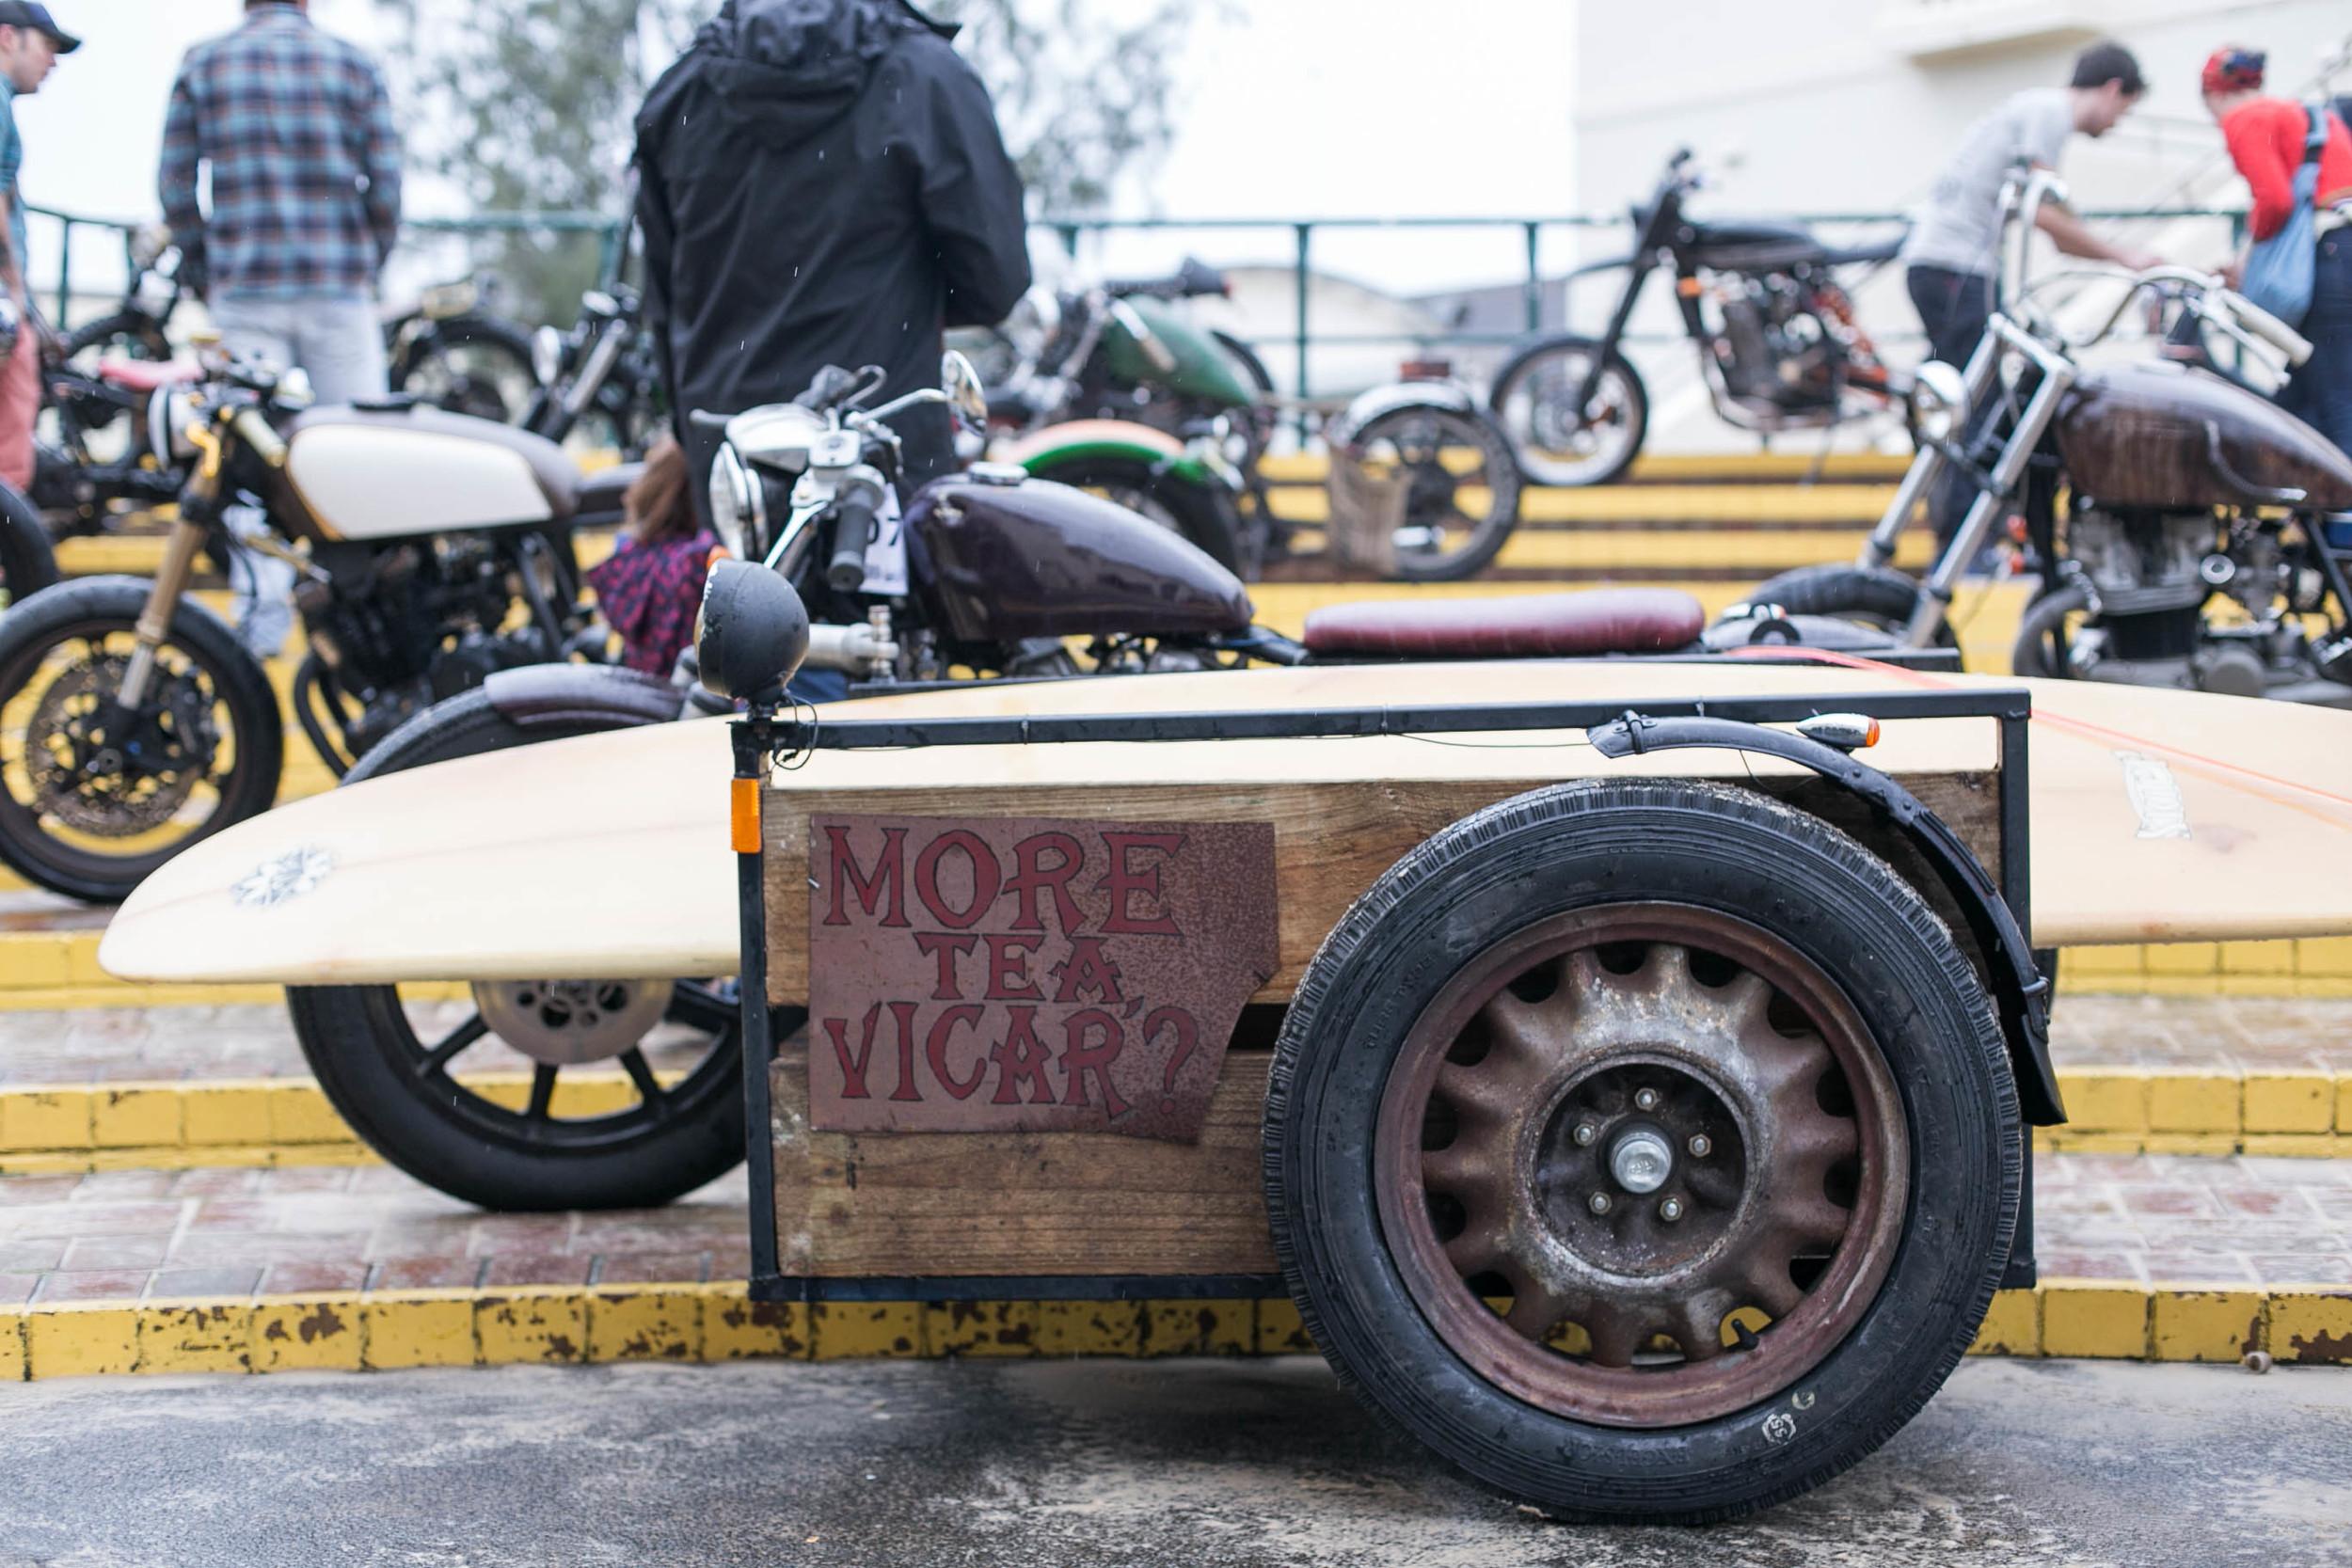 Rising_sun_workshop_deus_bike_build_off_sydney-7.jpg